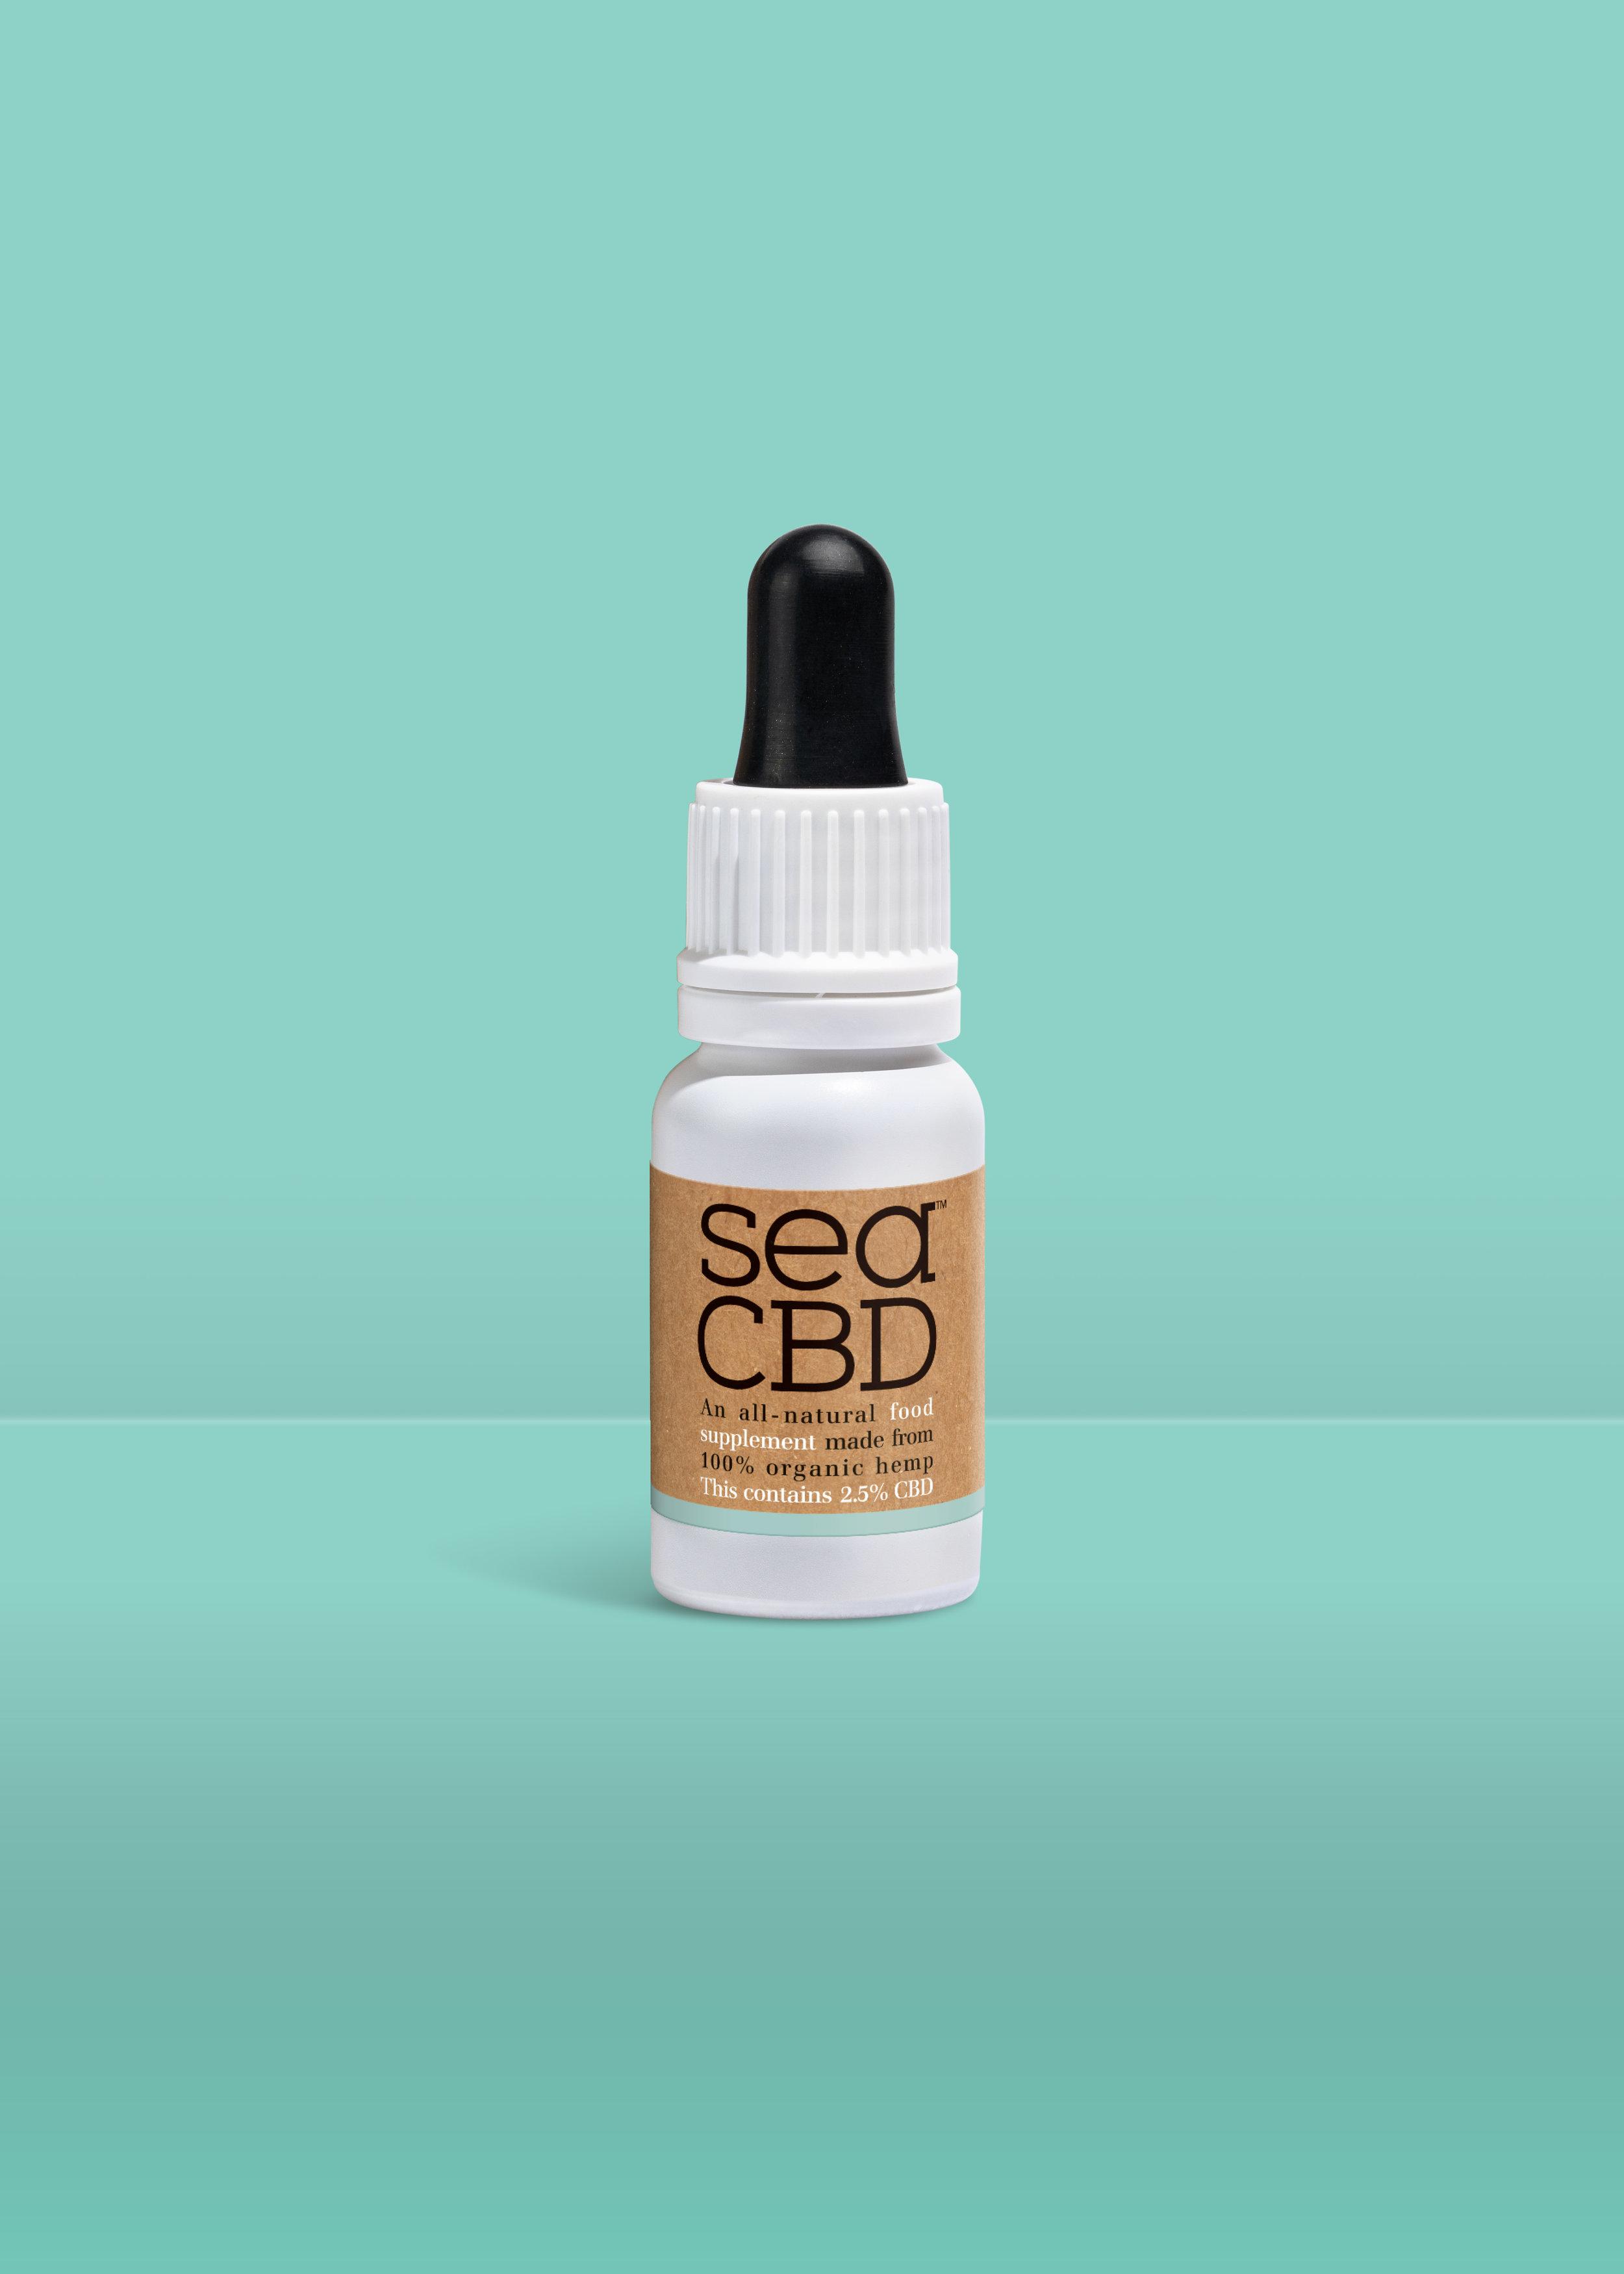 All-New Organic Supplement Sea CBD Unveils Brand Identity by Echo / World Brand Design Society